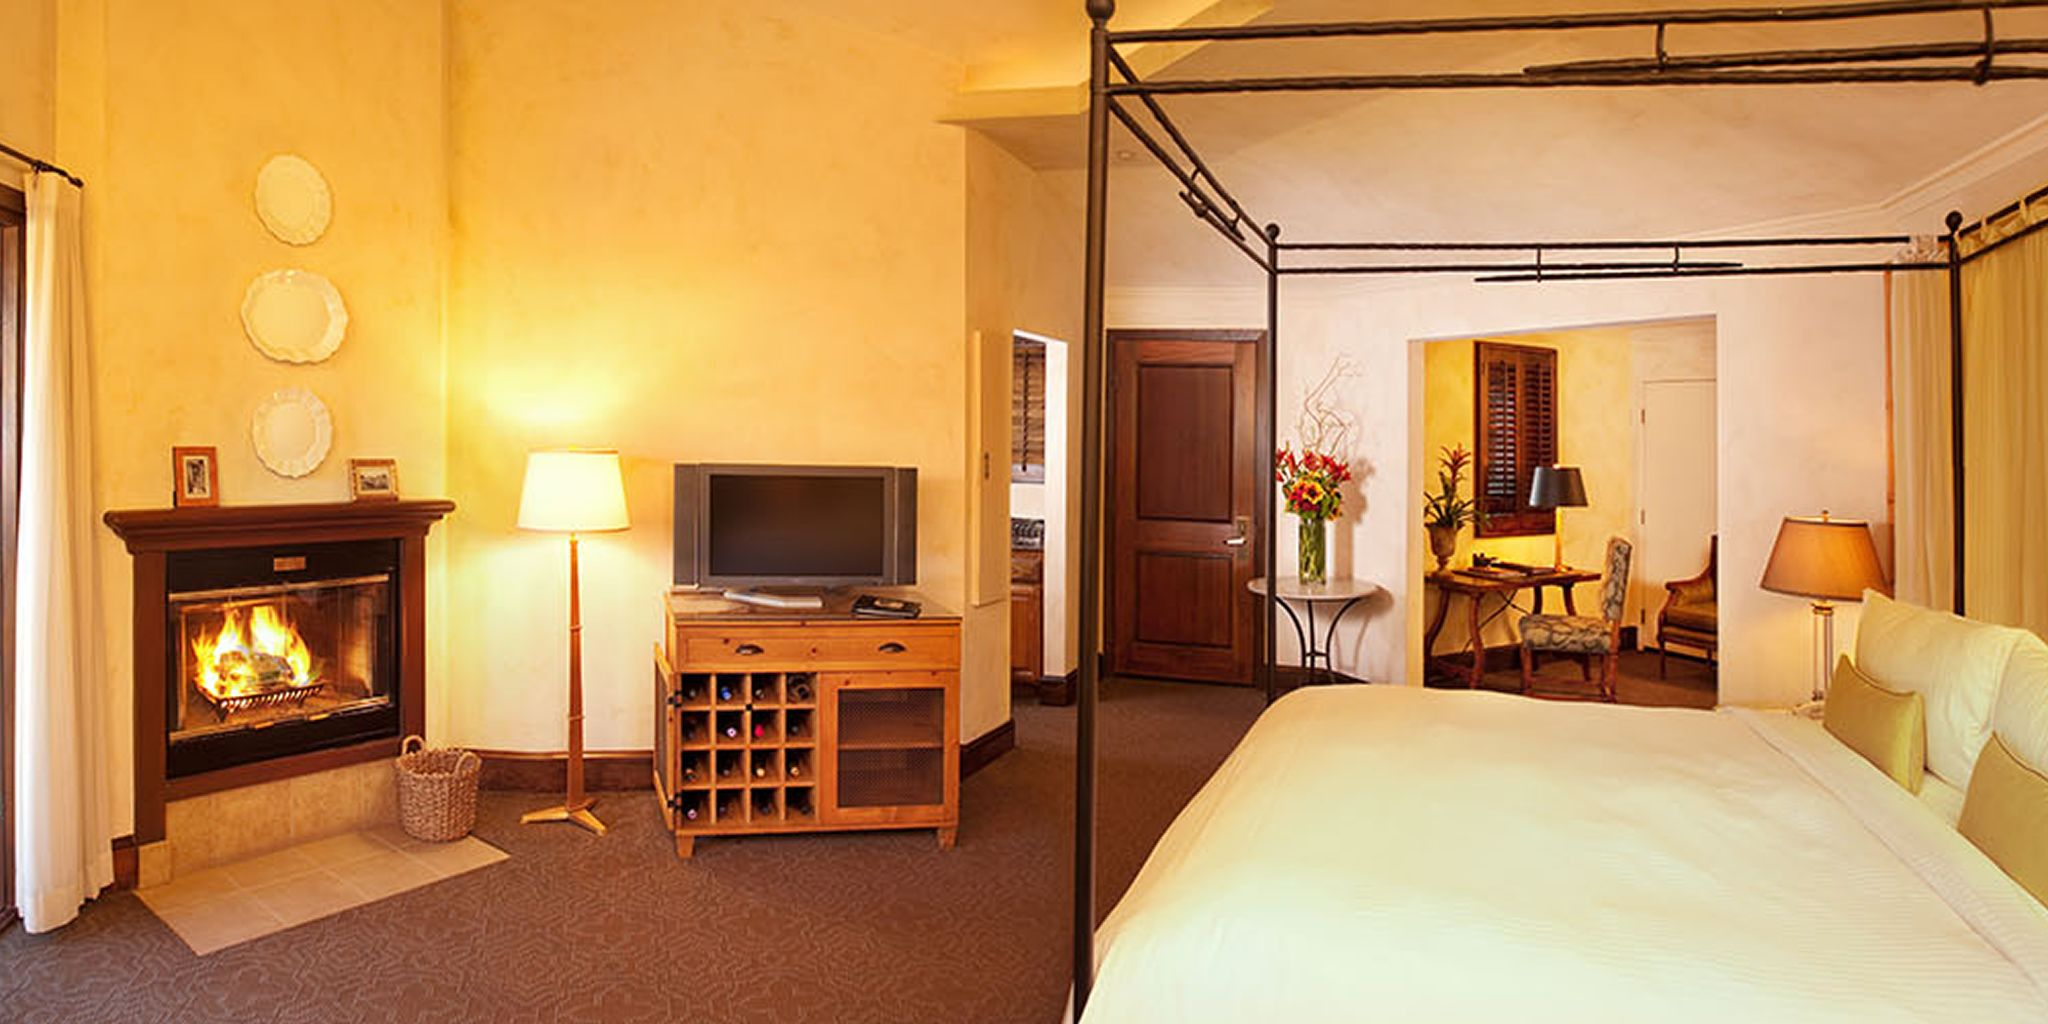 Hotel Villagio In Yountville California Inn Deals